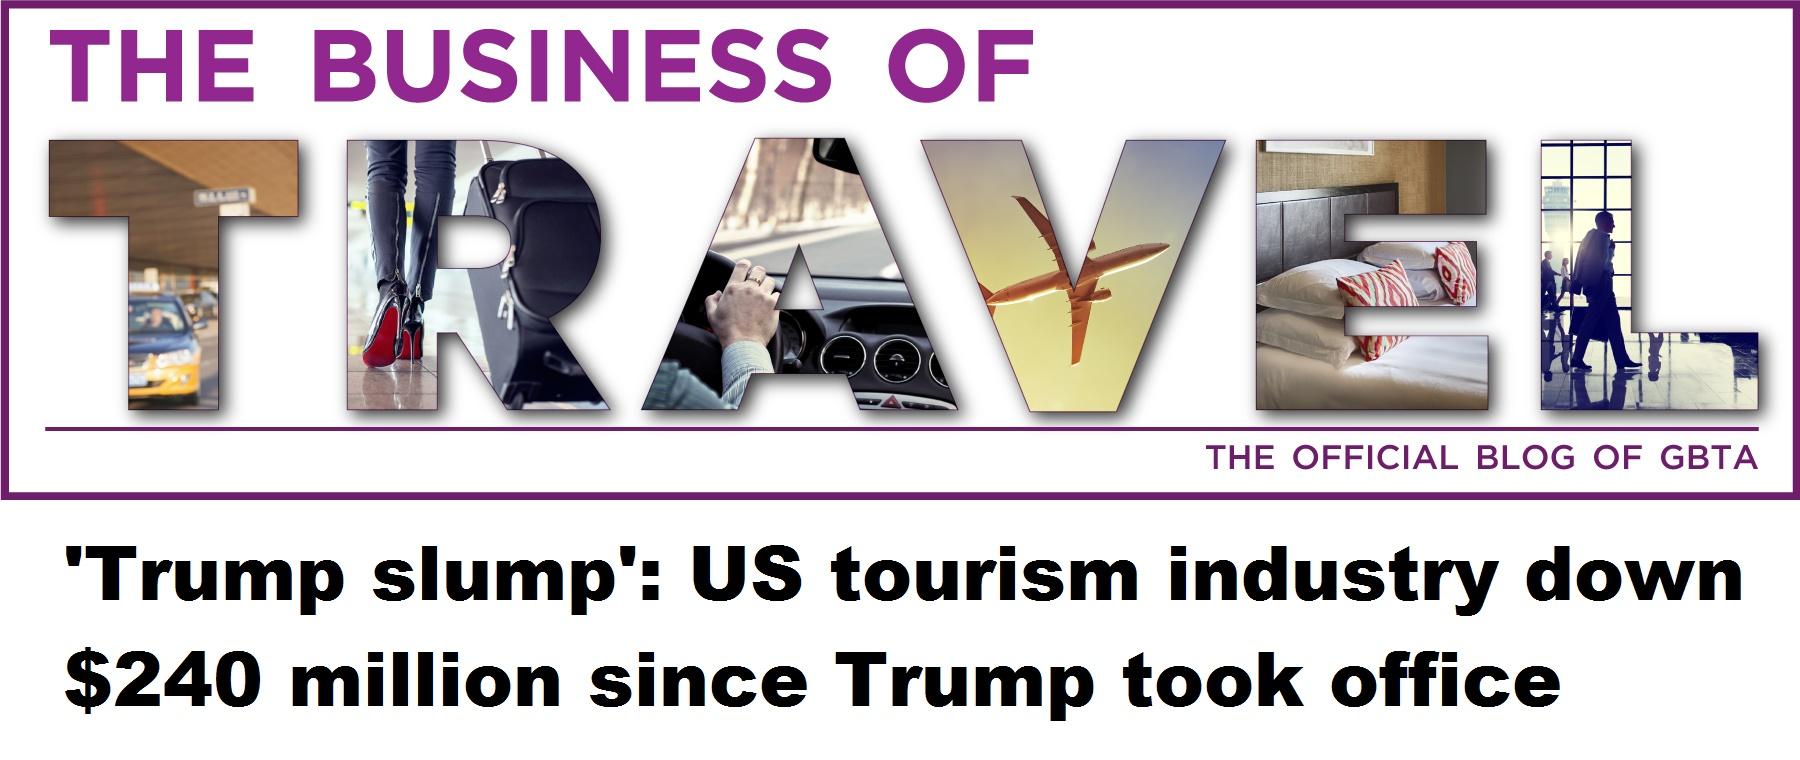 'Trump slump': US tourism industry down $240 million since Trump took office